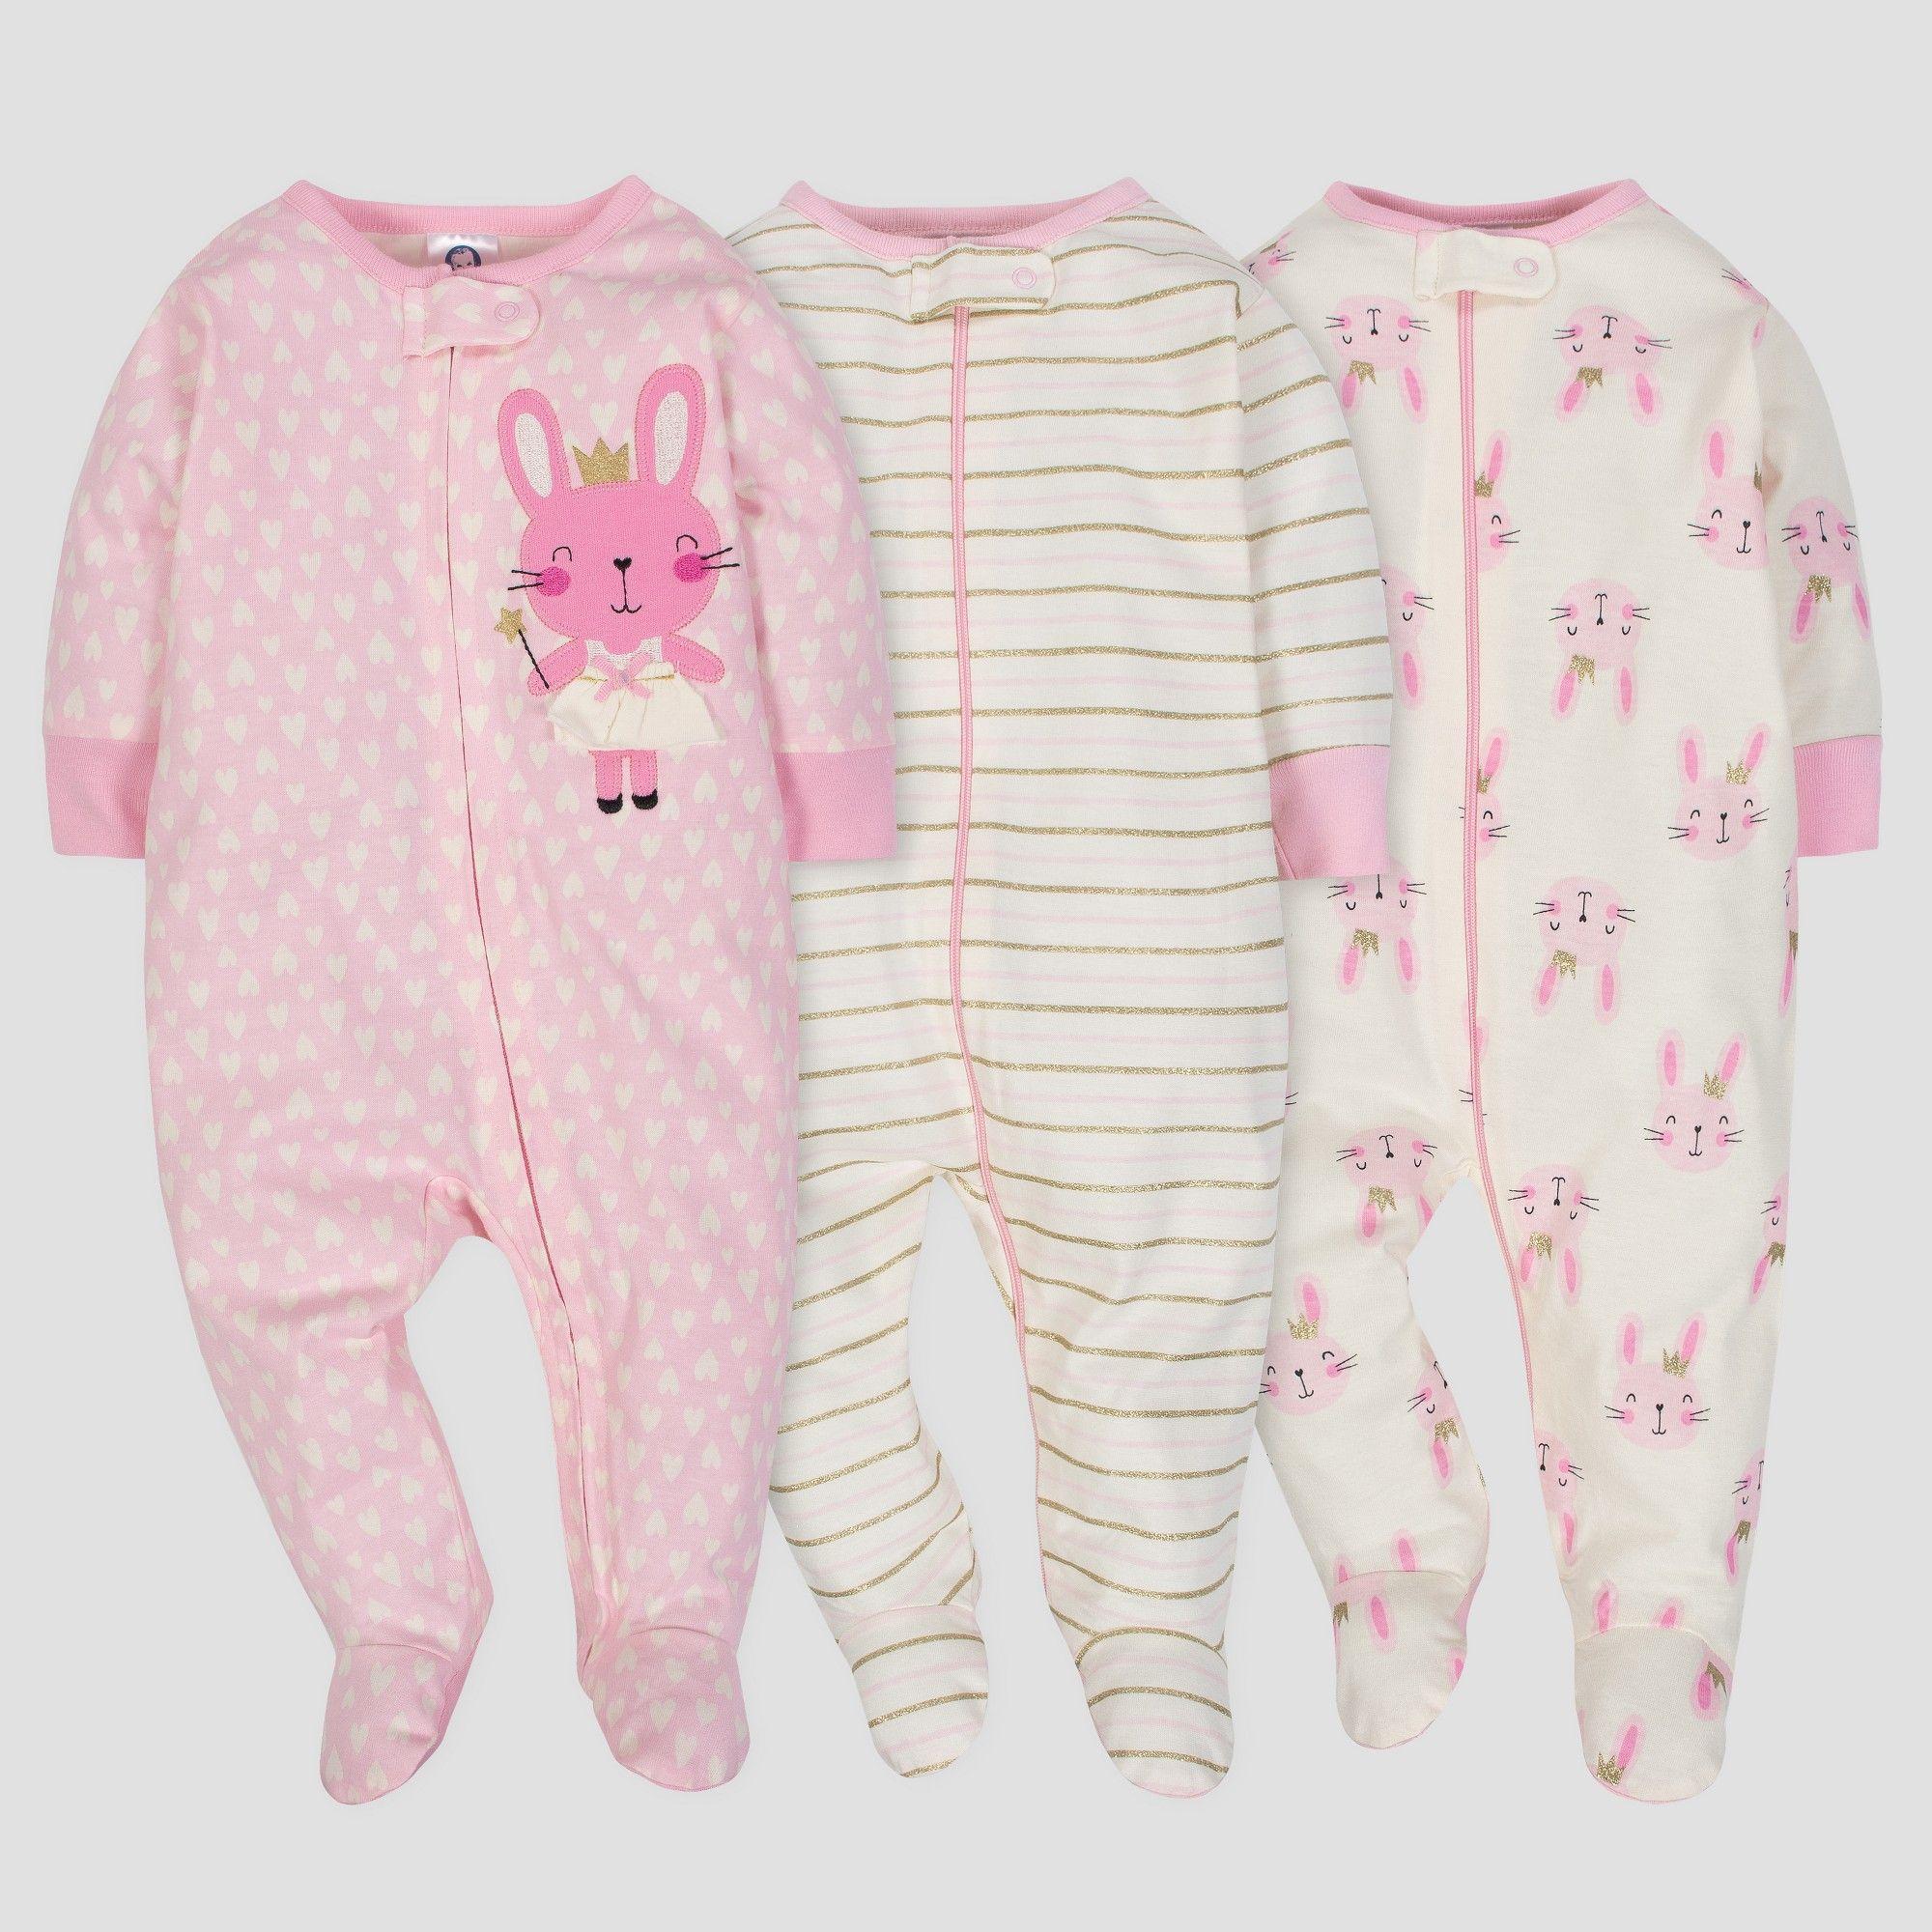 06451e7f3bfc Gerber Baby Girls  3pk Sleep  N Play Princess - Pink Cream 3 6M ...